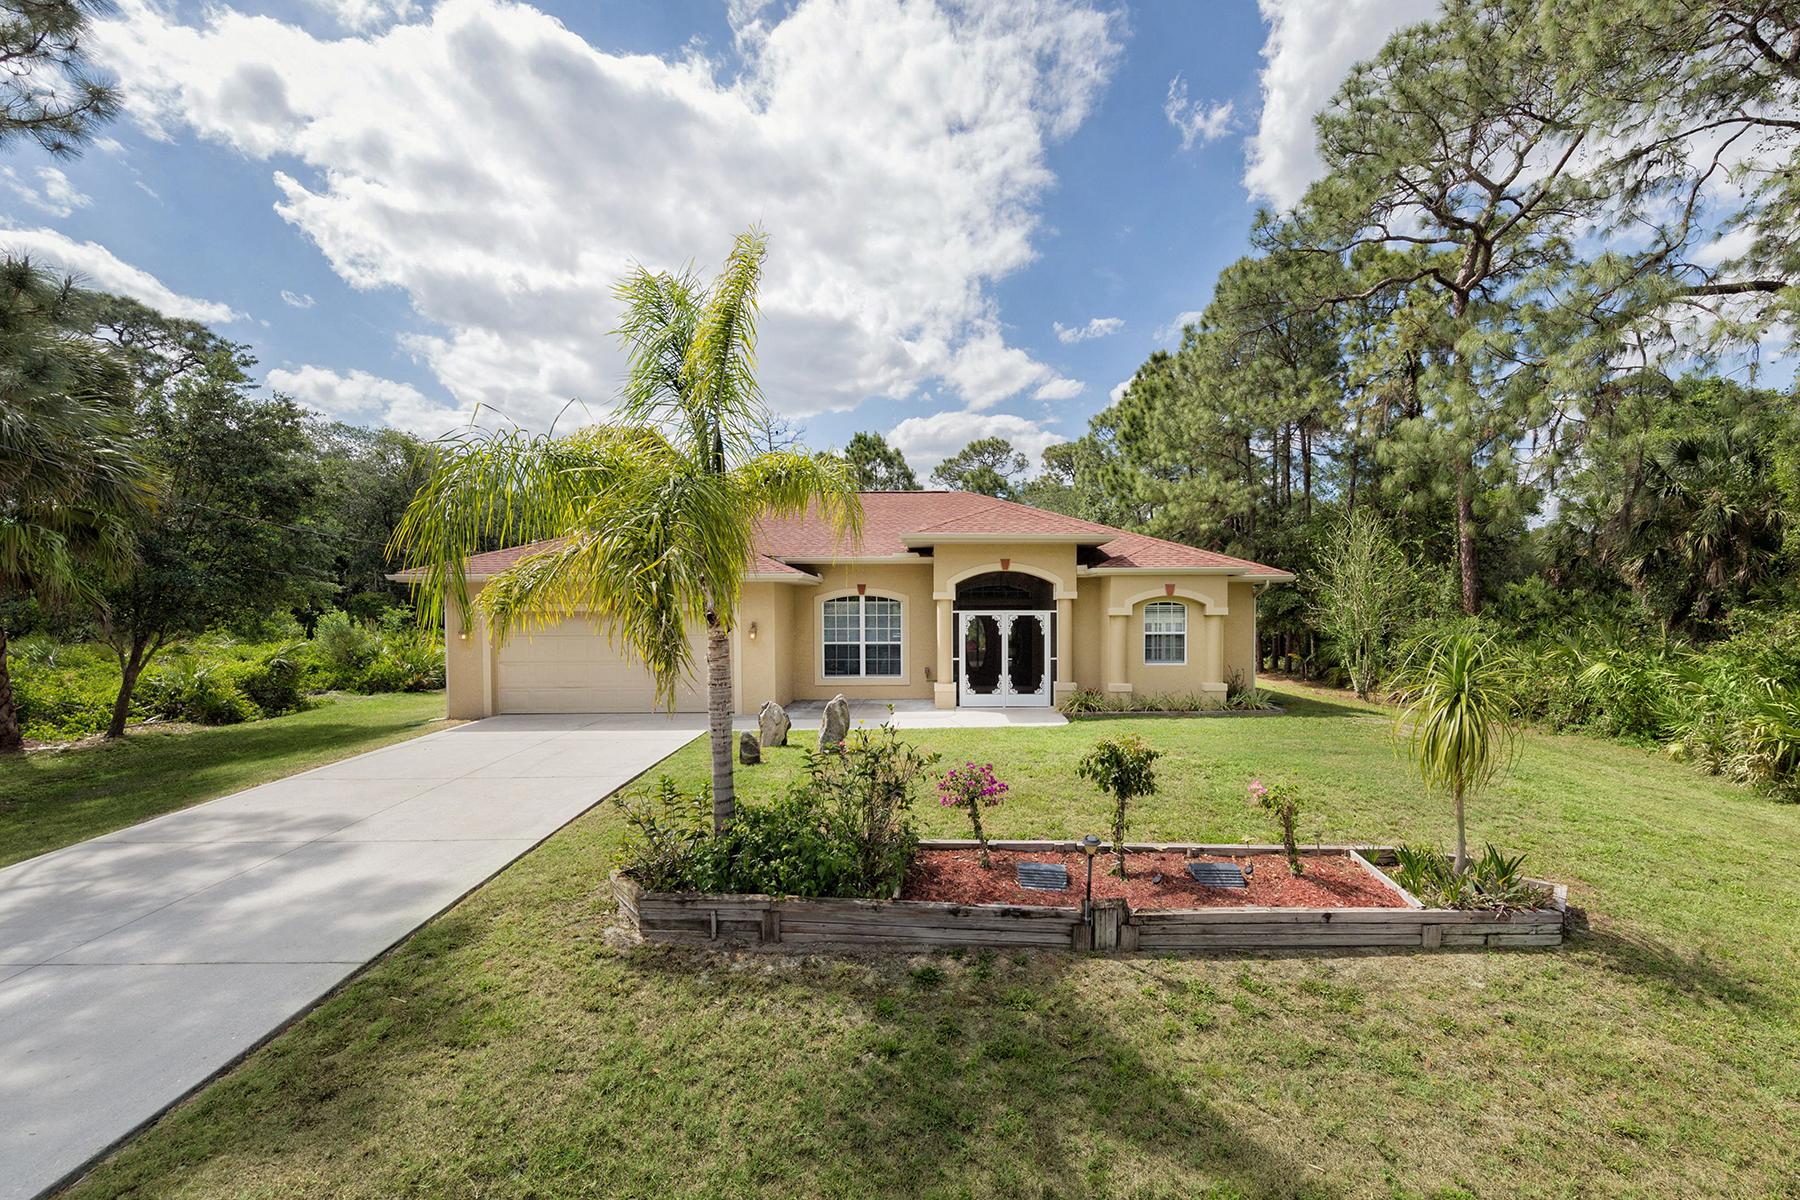 Single Family Home for Sale at NORTH PORT 2817 Zander Terr North Port, Florida 34286 United States